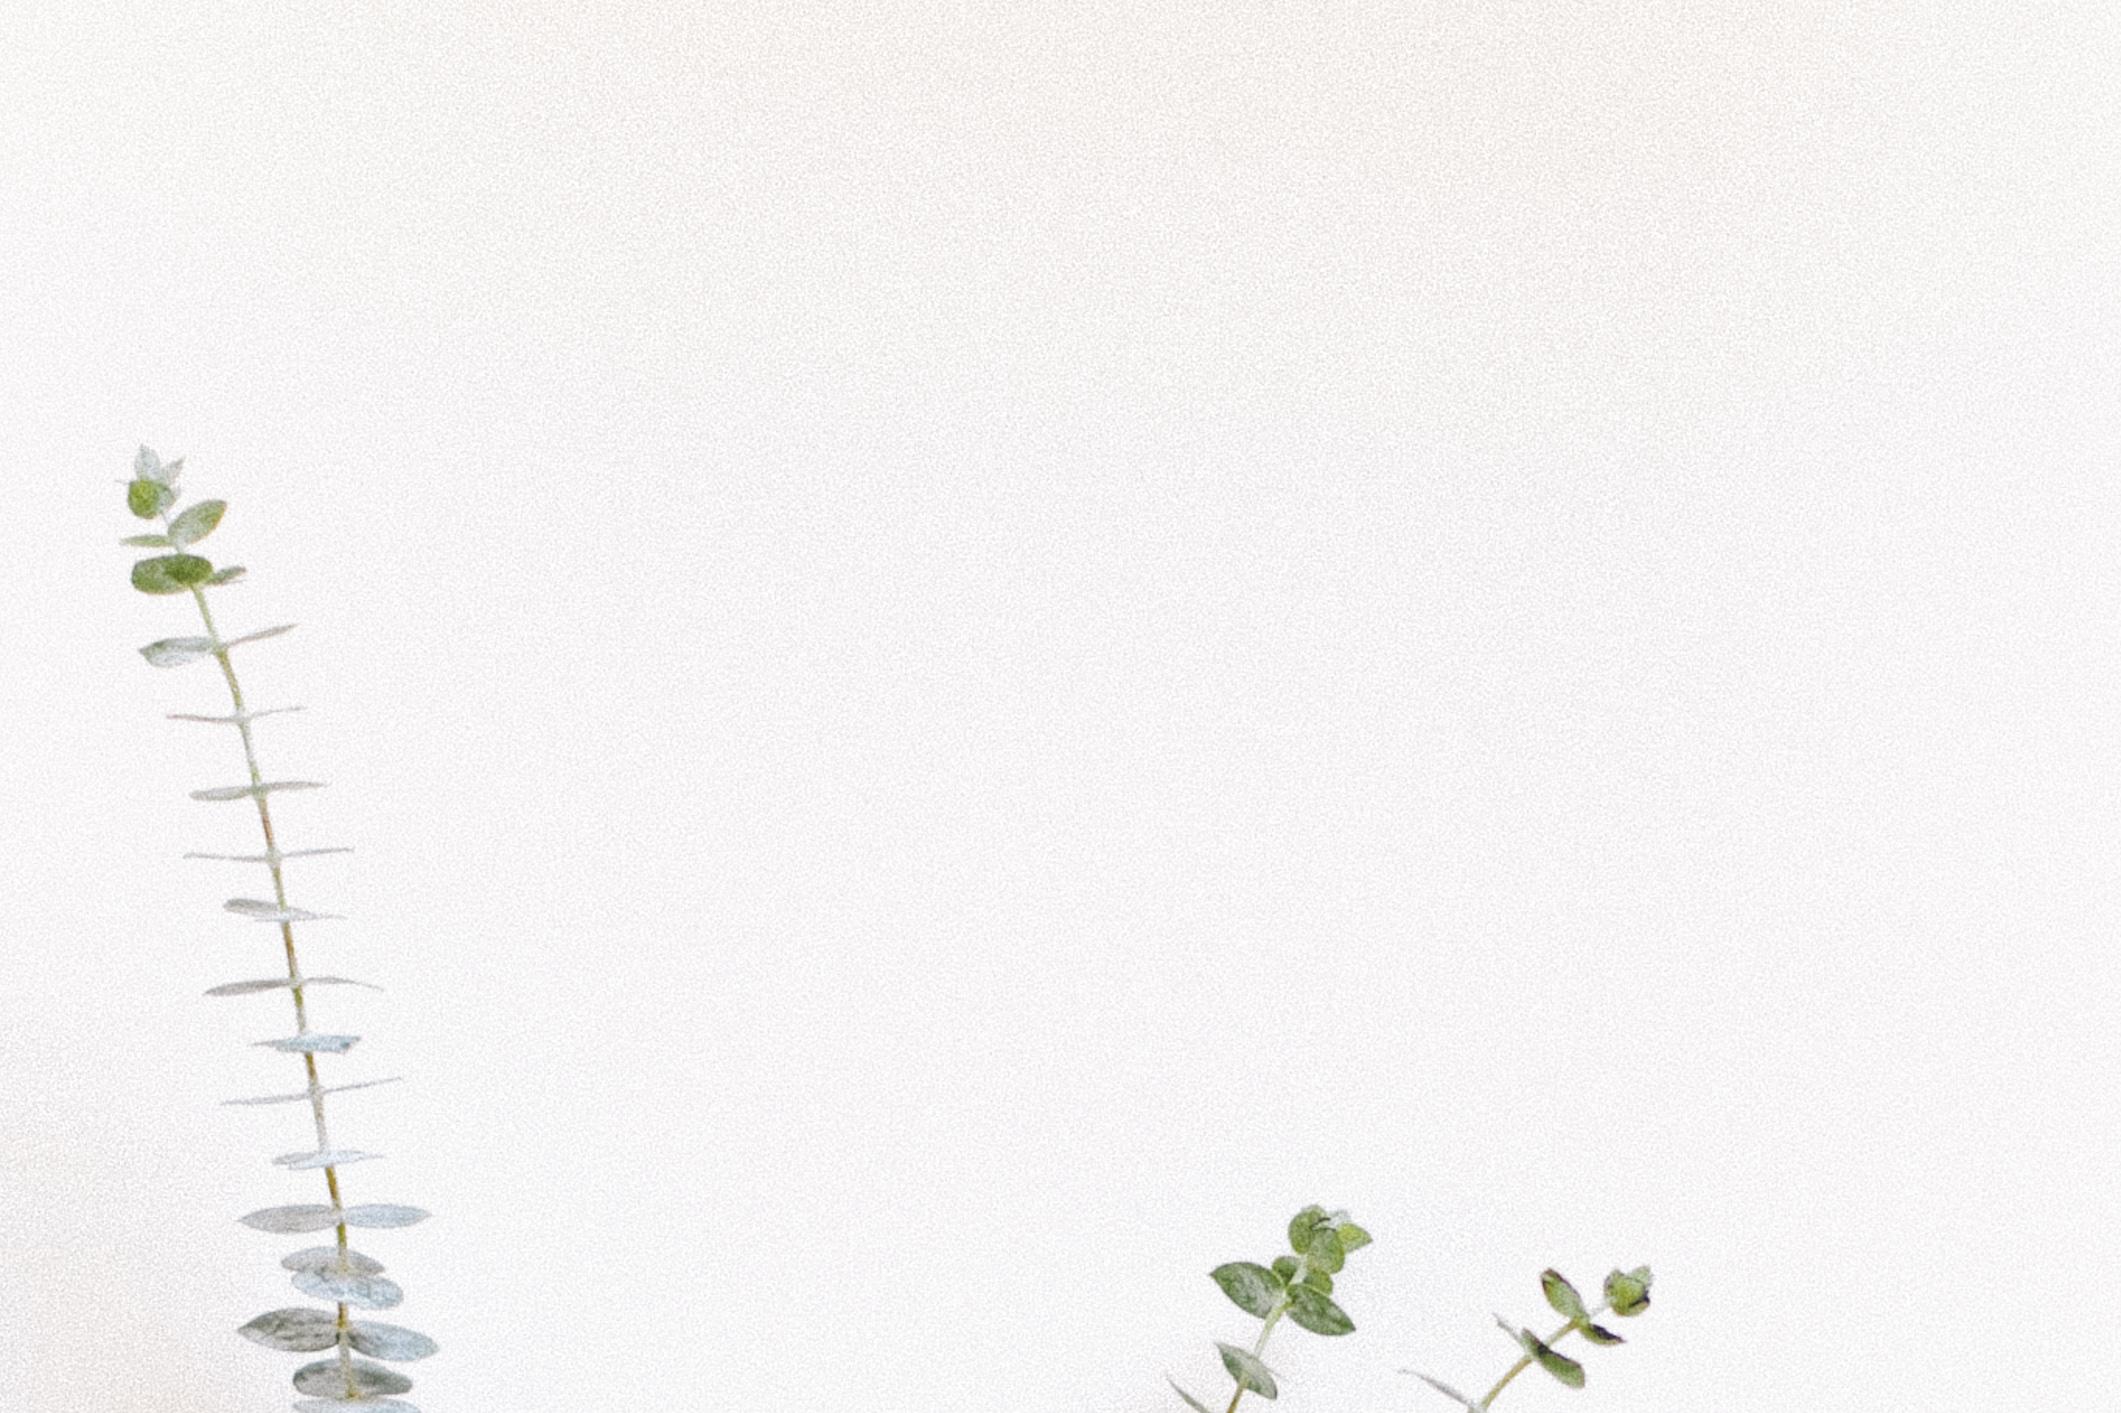 Eucalyptus detail by Naomi Yamada